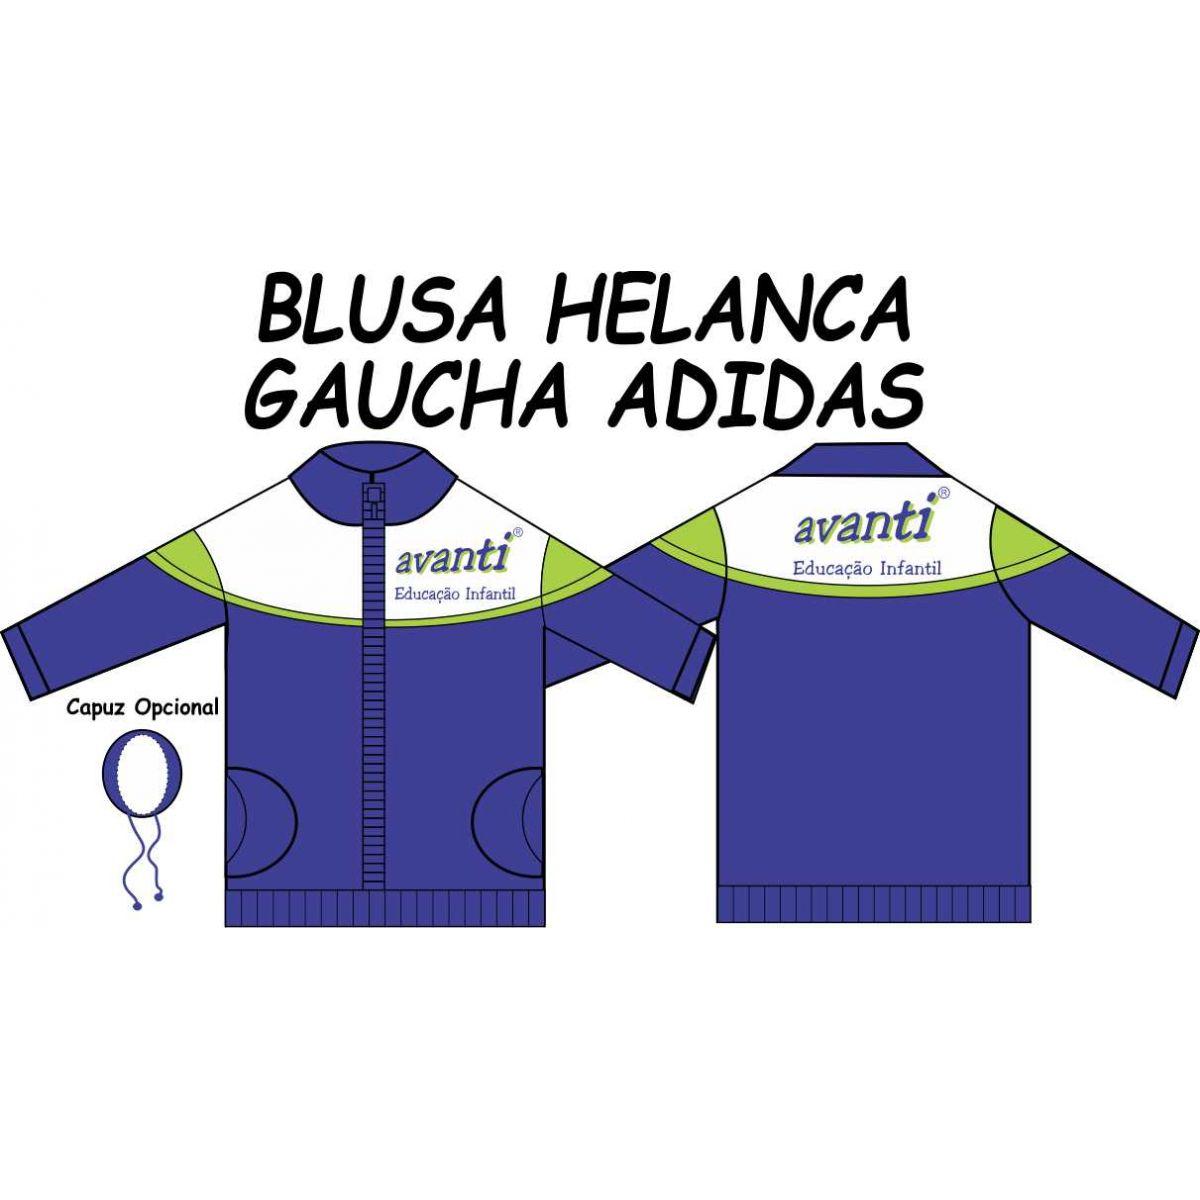 Blusa Helanca Gaucha Adidas Aberta Avanti